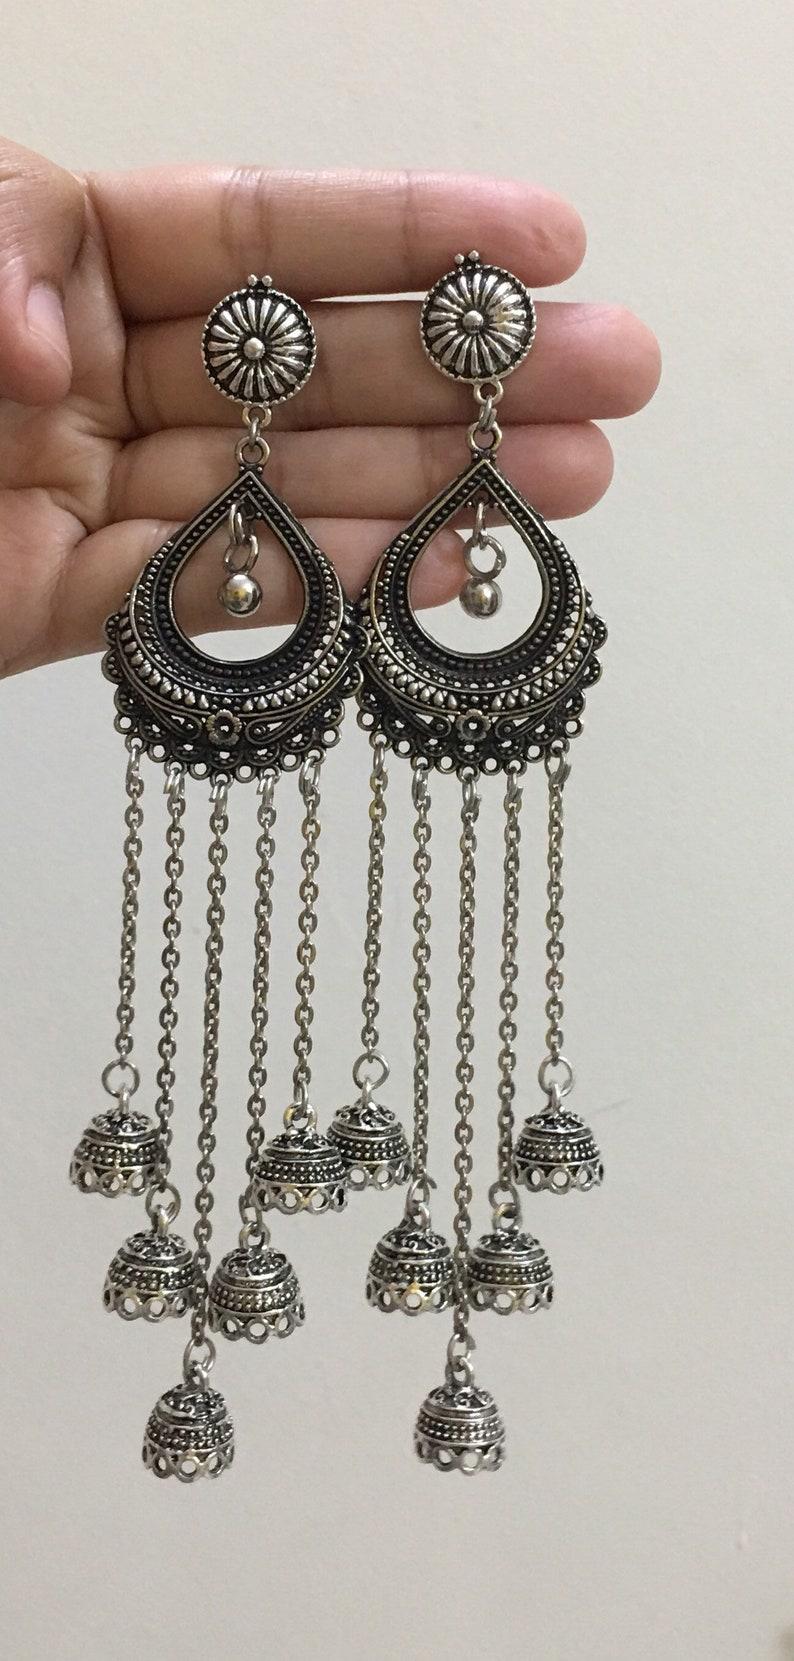 Multiple Jhumka German Silver Earrings Oxidised Silver Jhaalar Jhumka Earrings